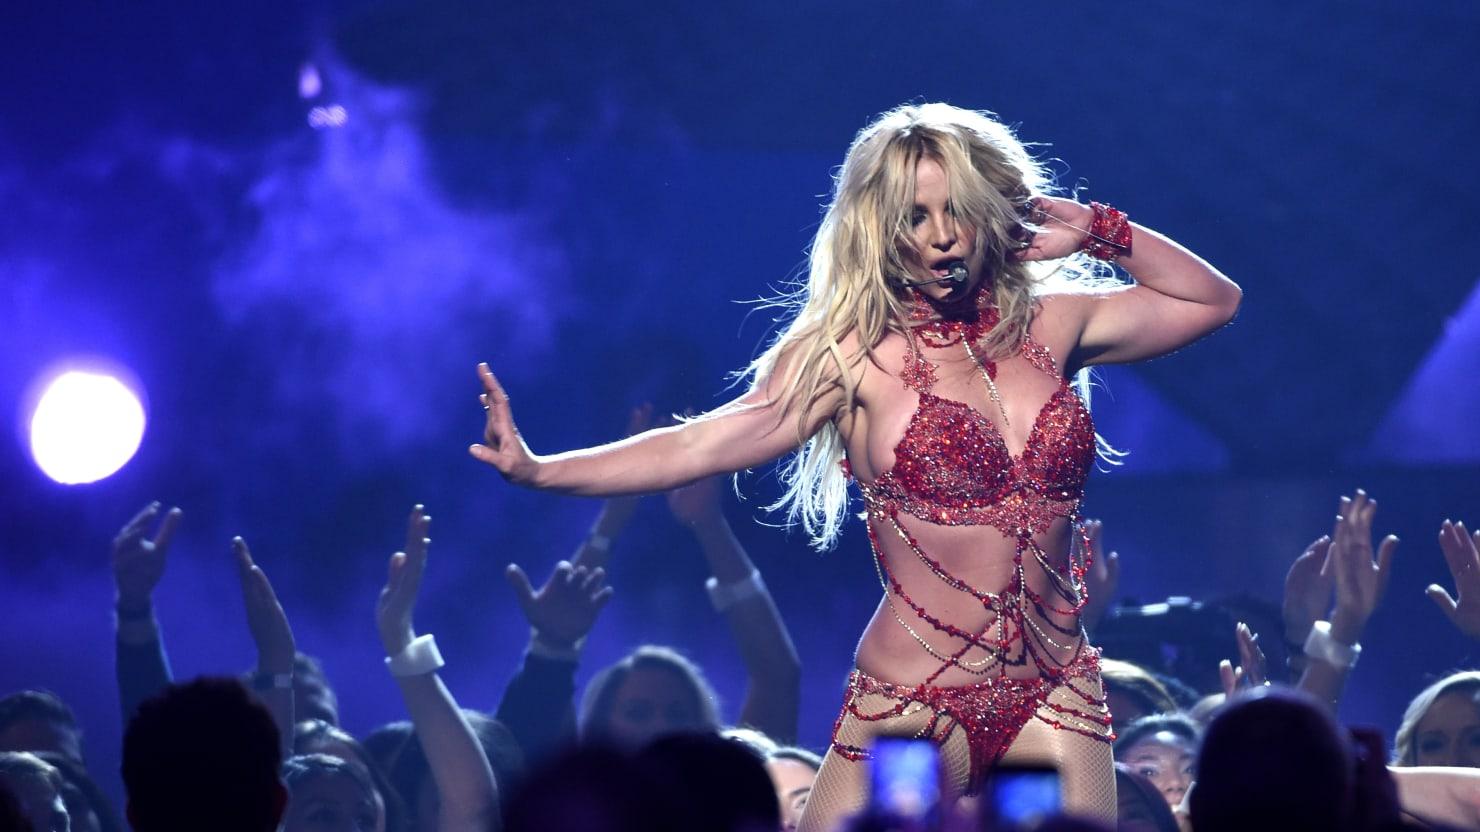 image Britney spears work bitch